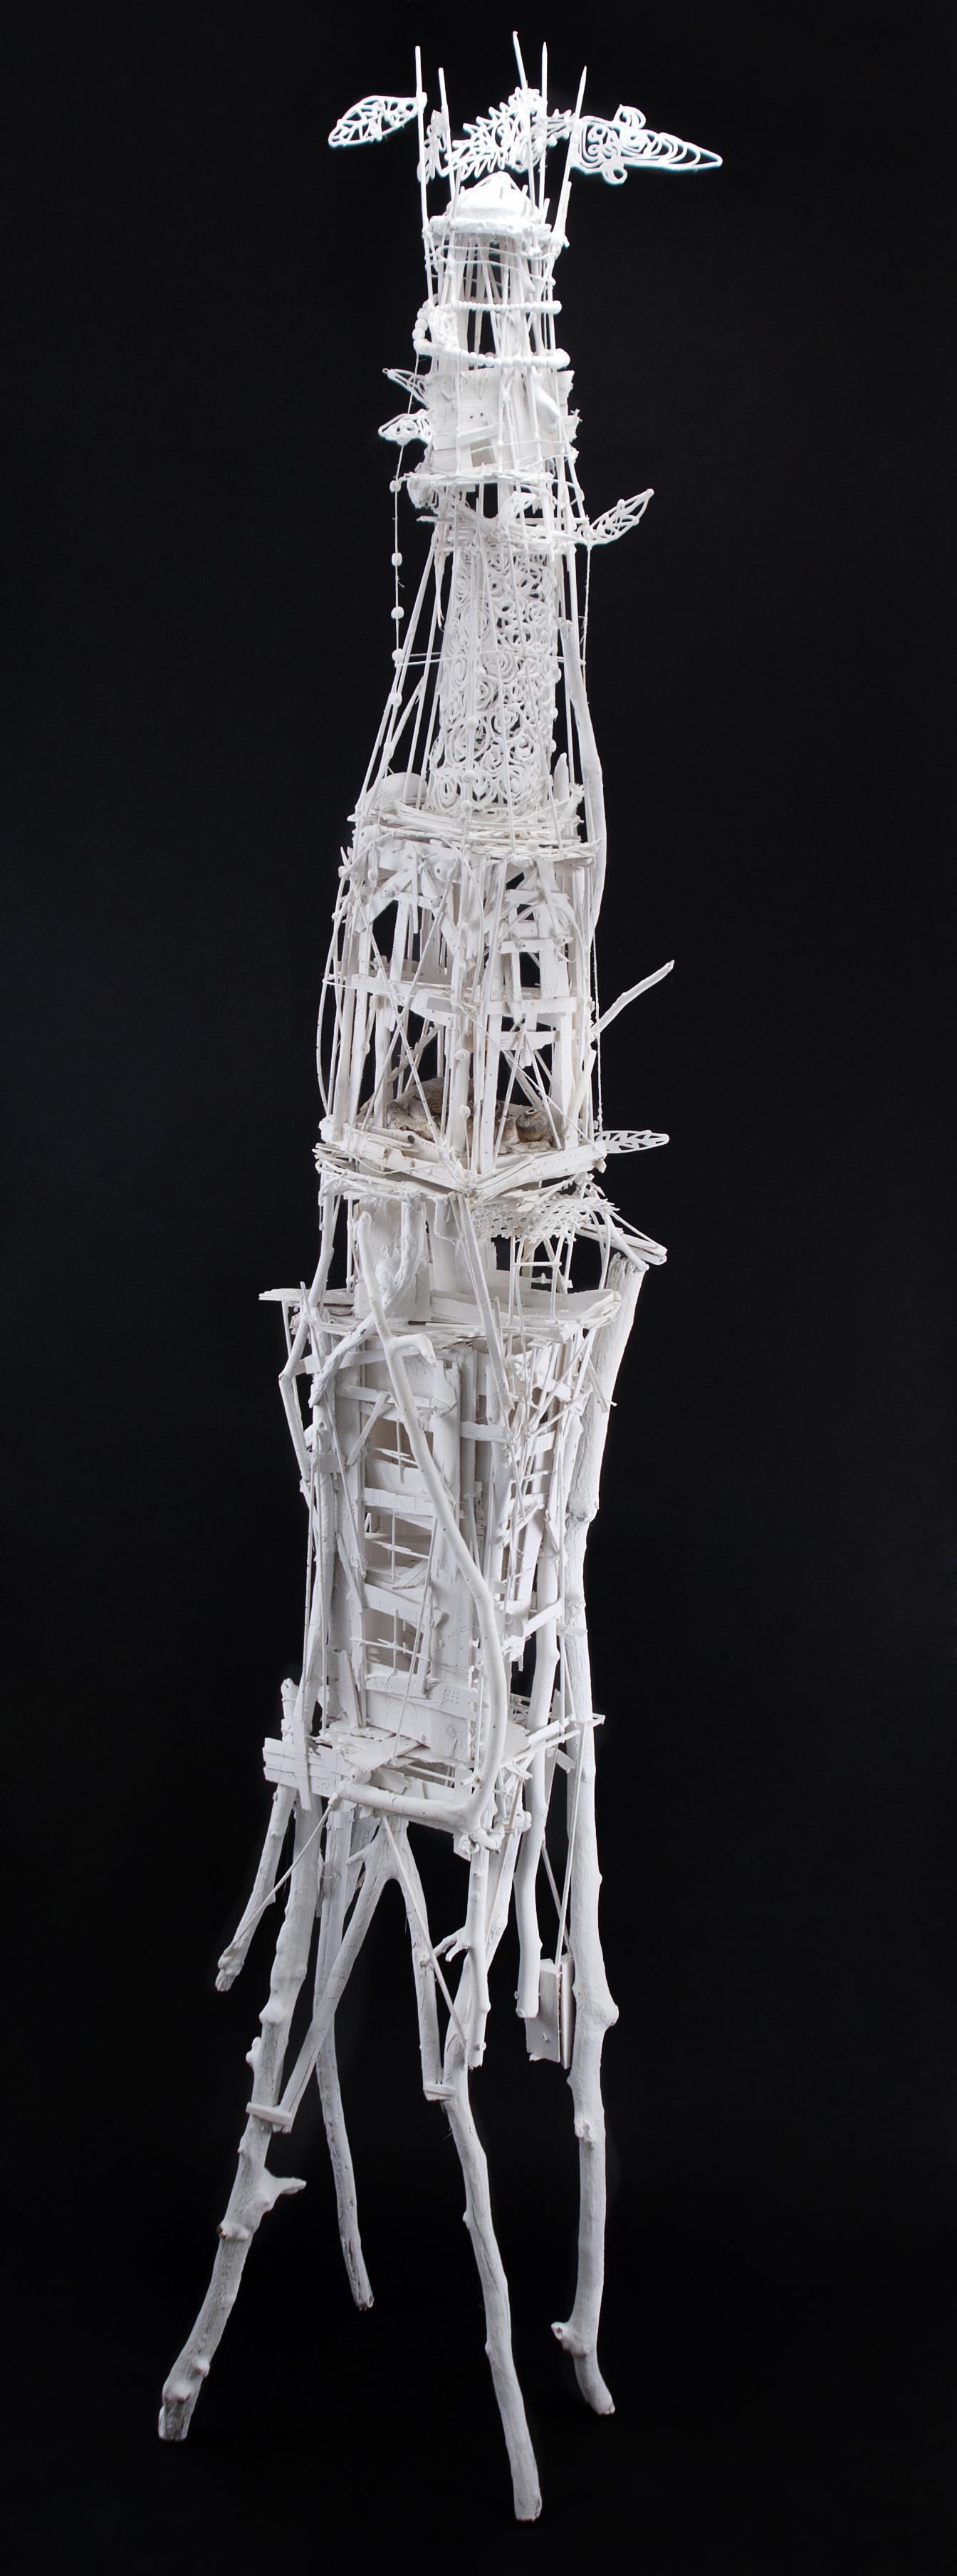 Sylvain Corentin    Rome Tower  , 2012 Wood, canvas, wire, yarn, glue, paint 88 x 16 x 13 inches / 223.5 x 40.6 x 33 cm / SCo 5